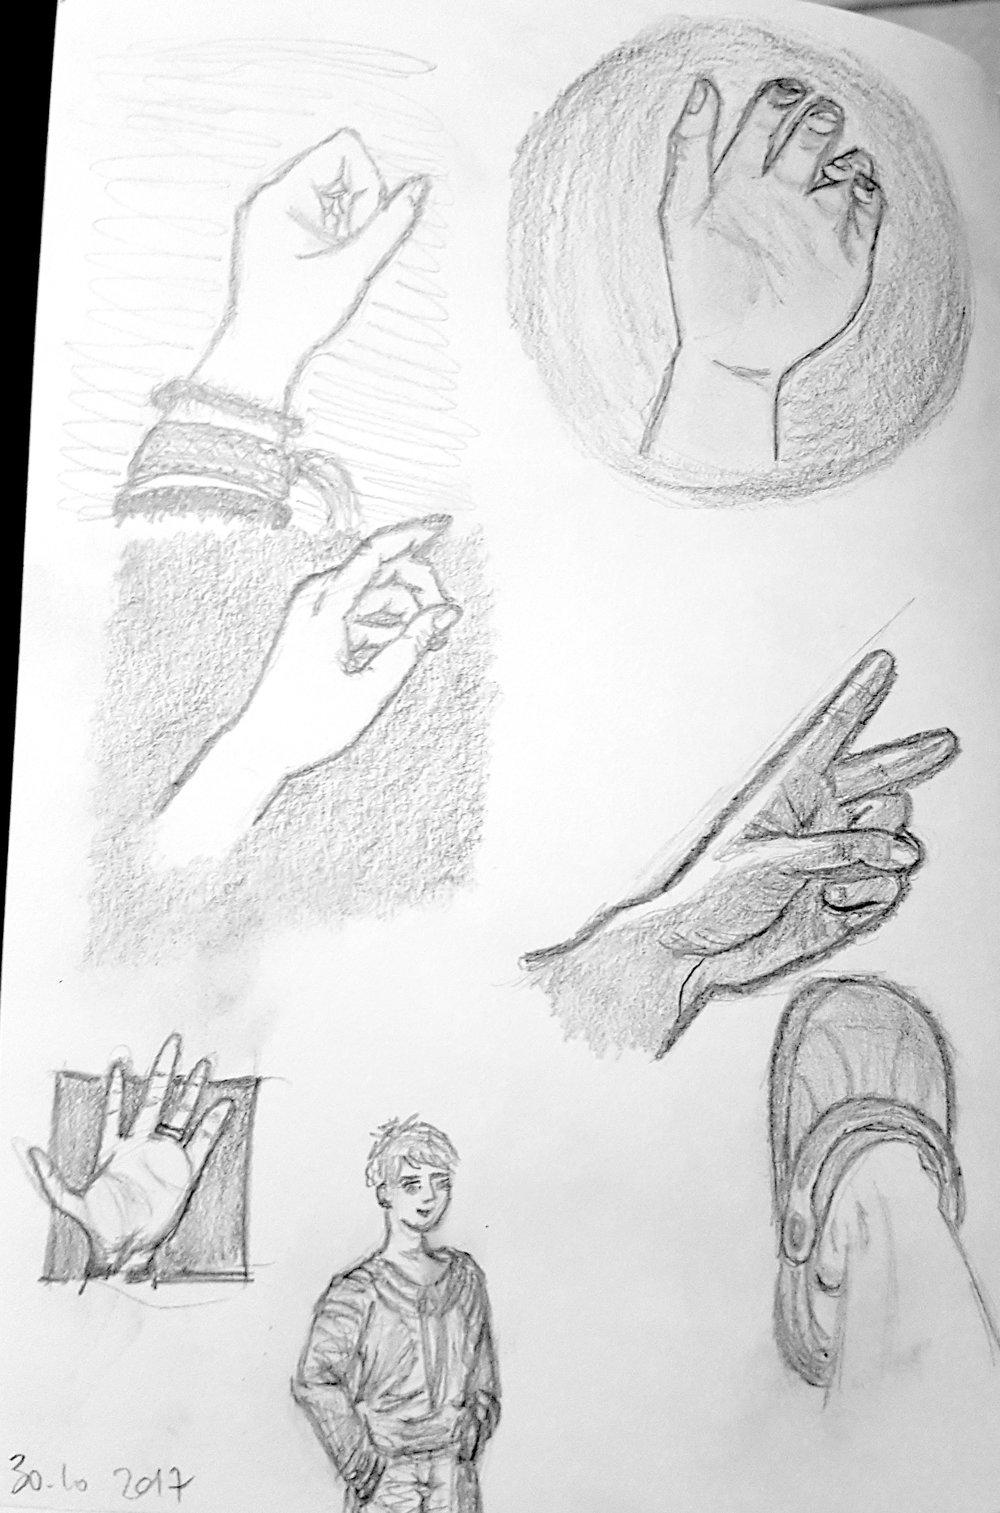 2017 10 30 - Croquis et mains.jpg